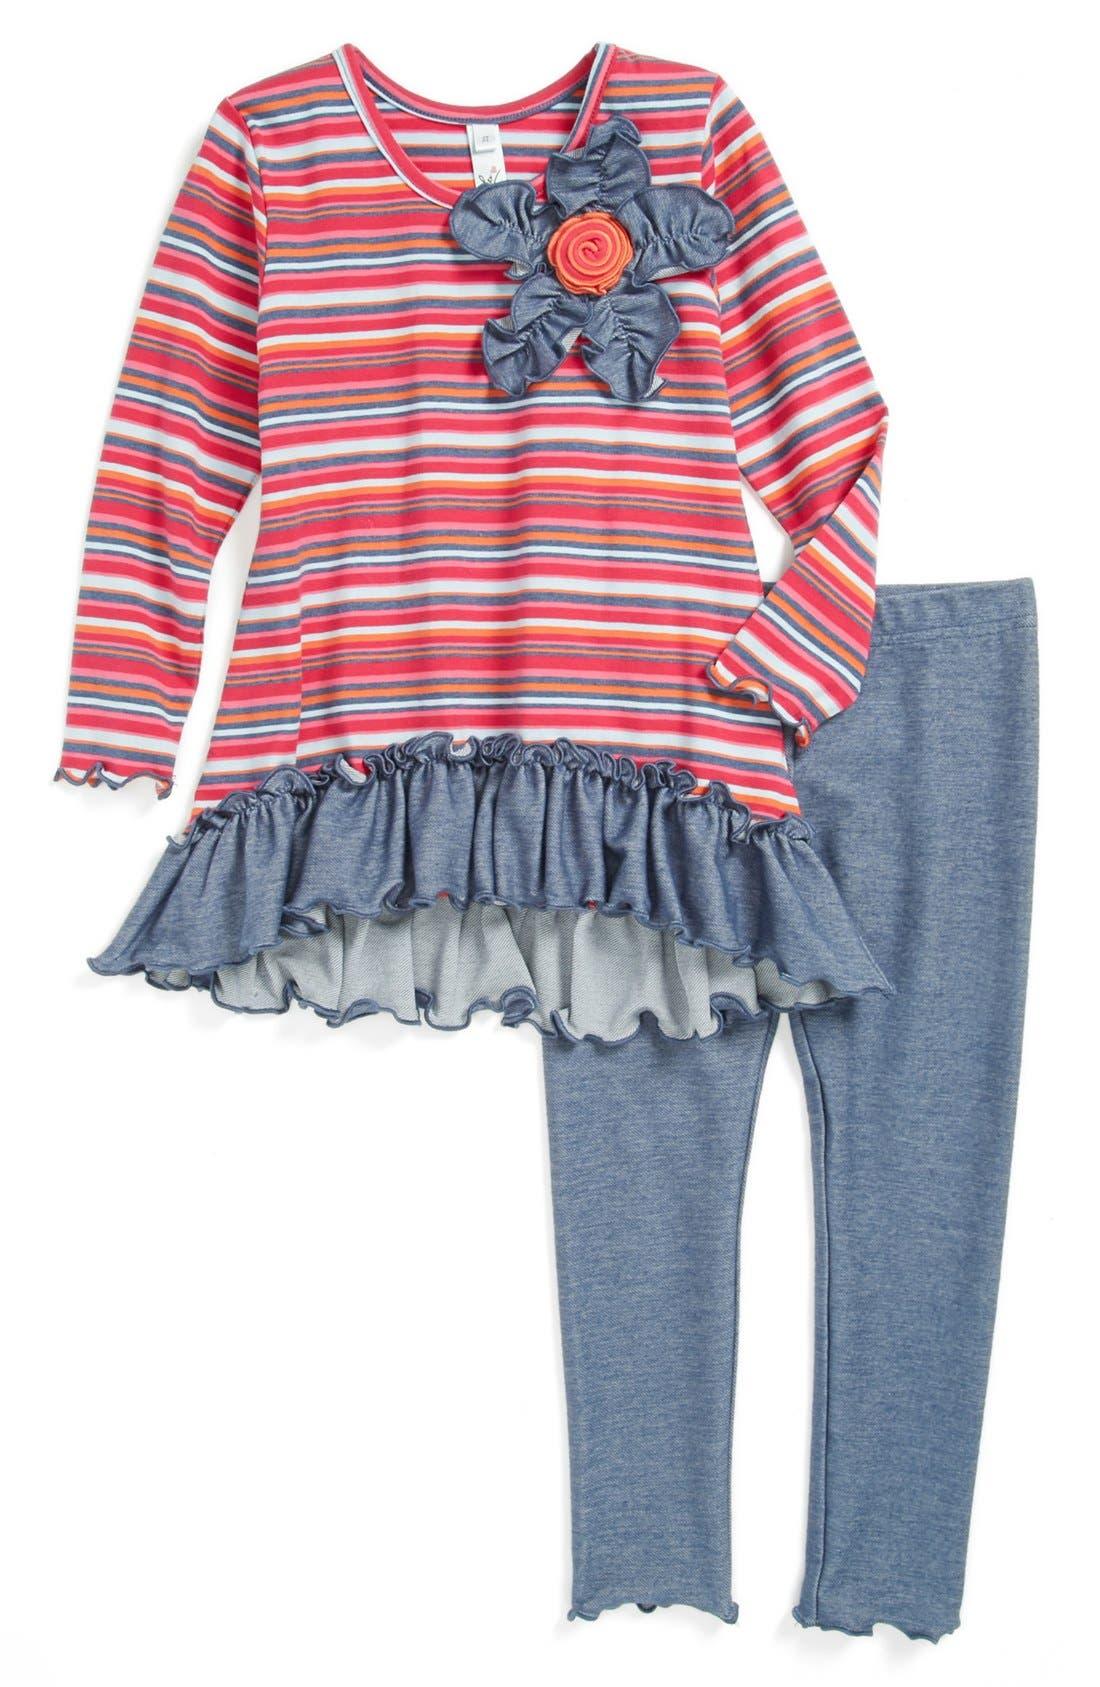 Alternate Image 1 Selected - Love U Lots Tunic & Leggings (Toddler Girls)